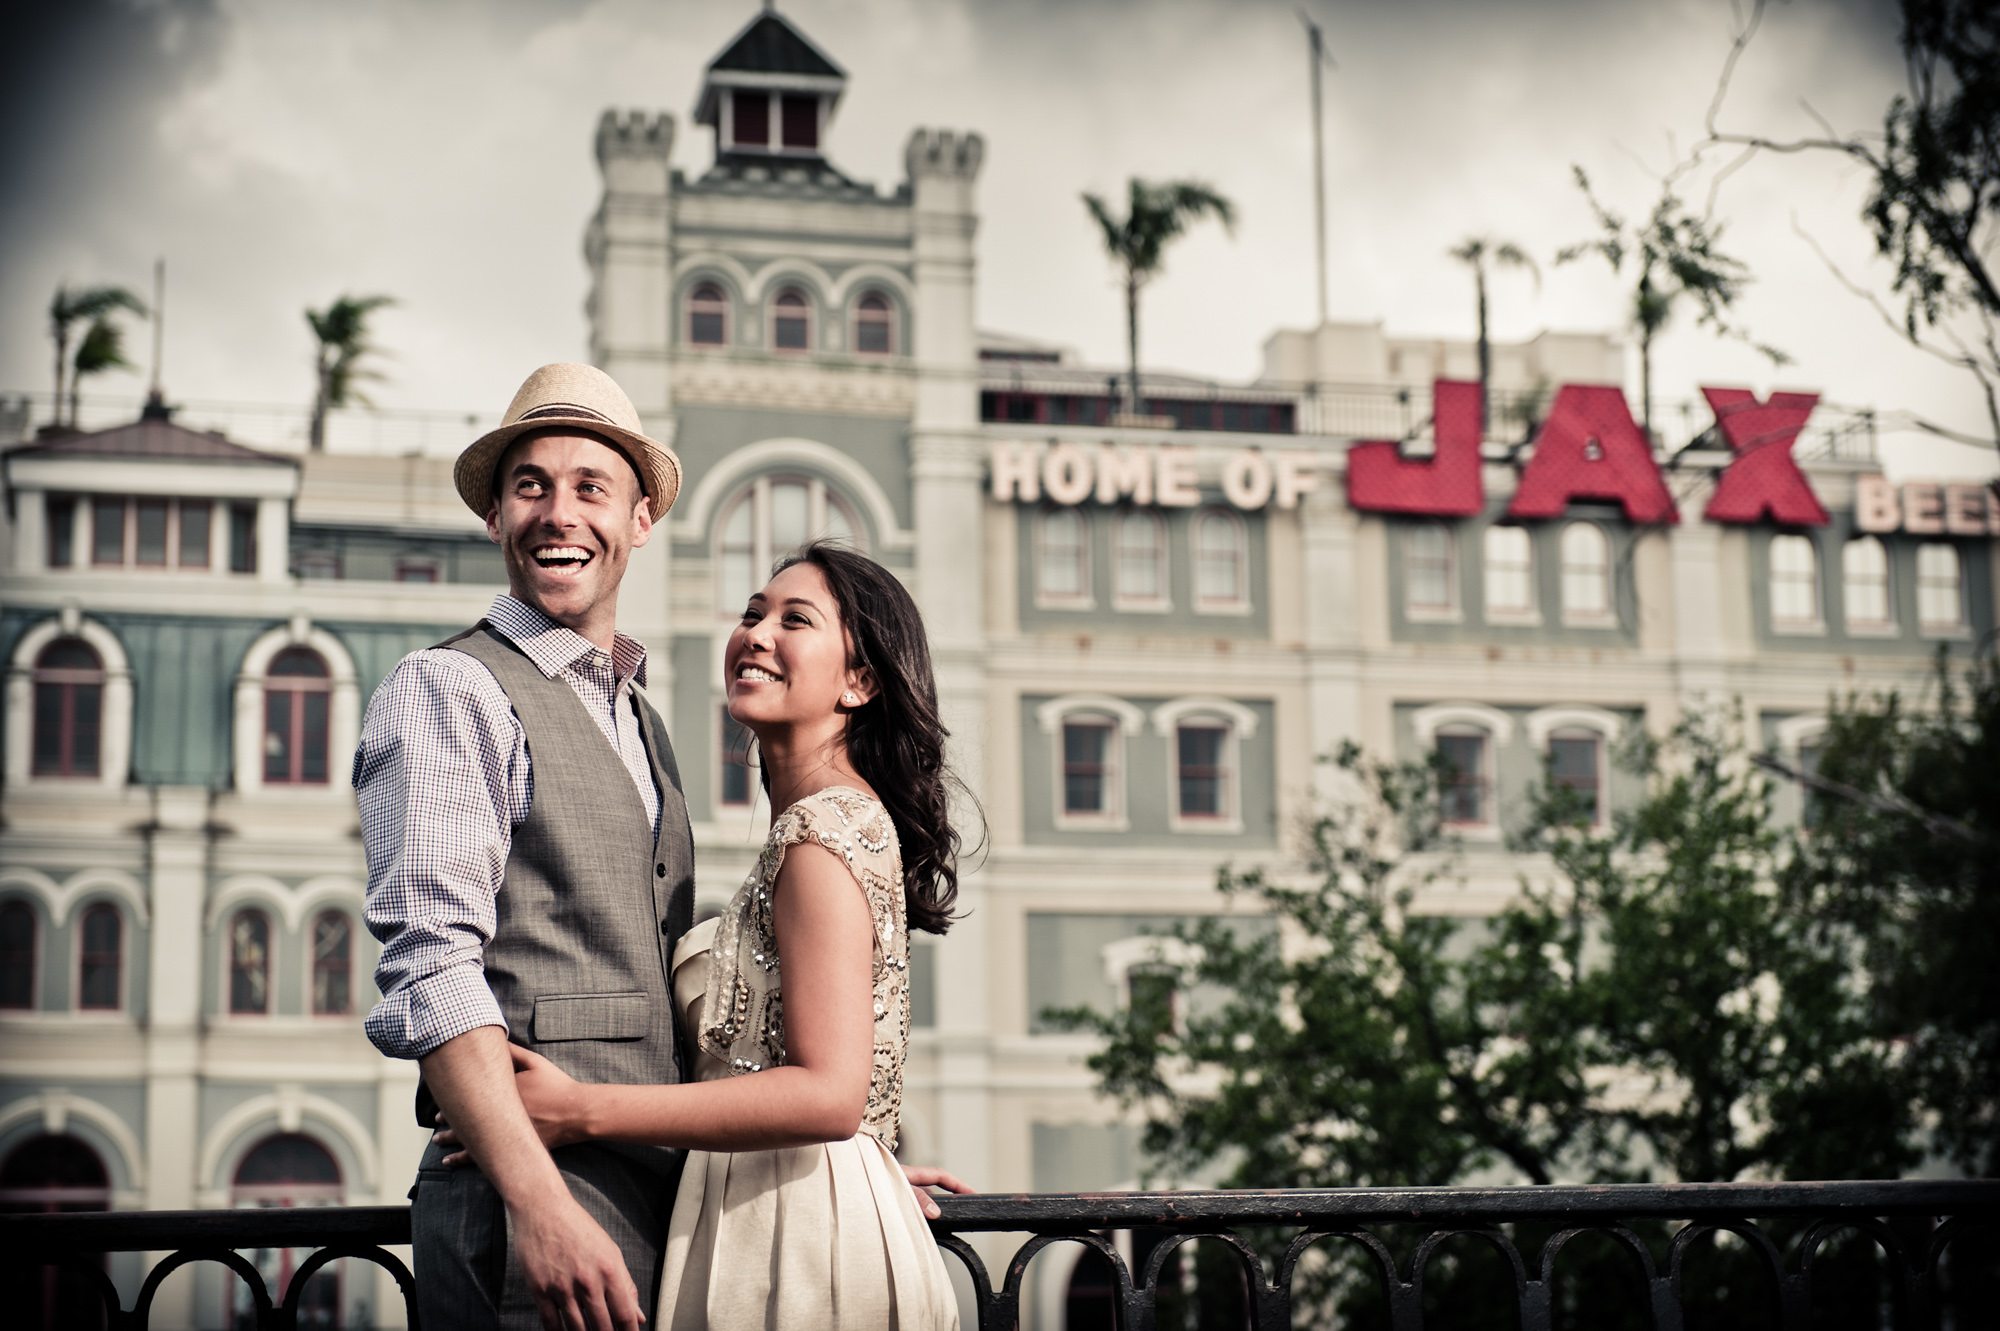 Scott-Myers-Photography-WeddingScott-Myers-Photography-Wedding_SAM0434.jpg